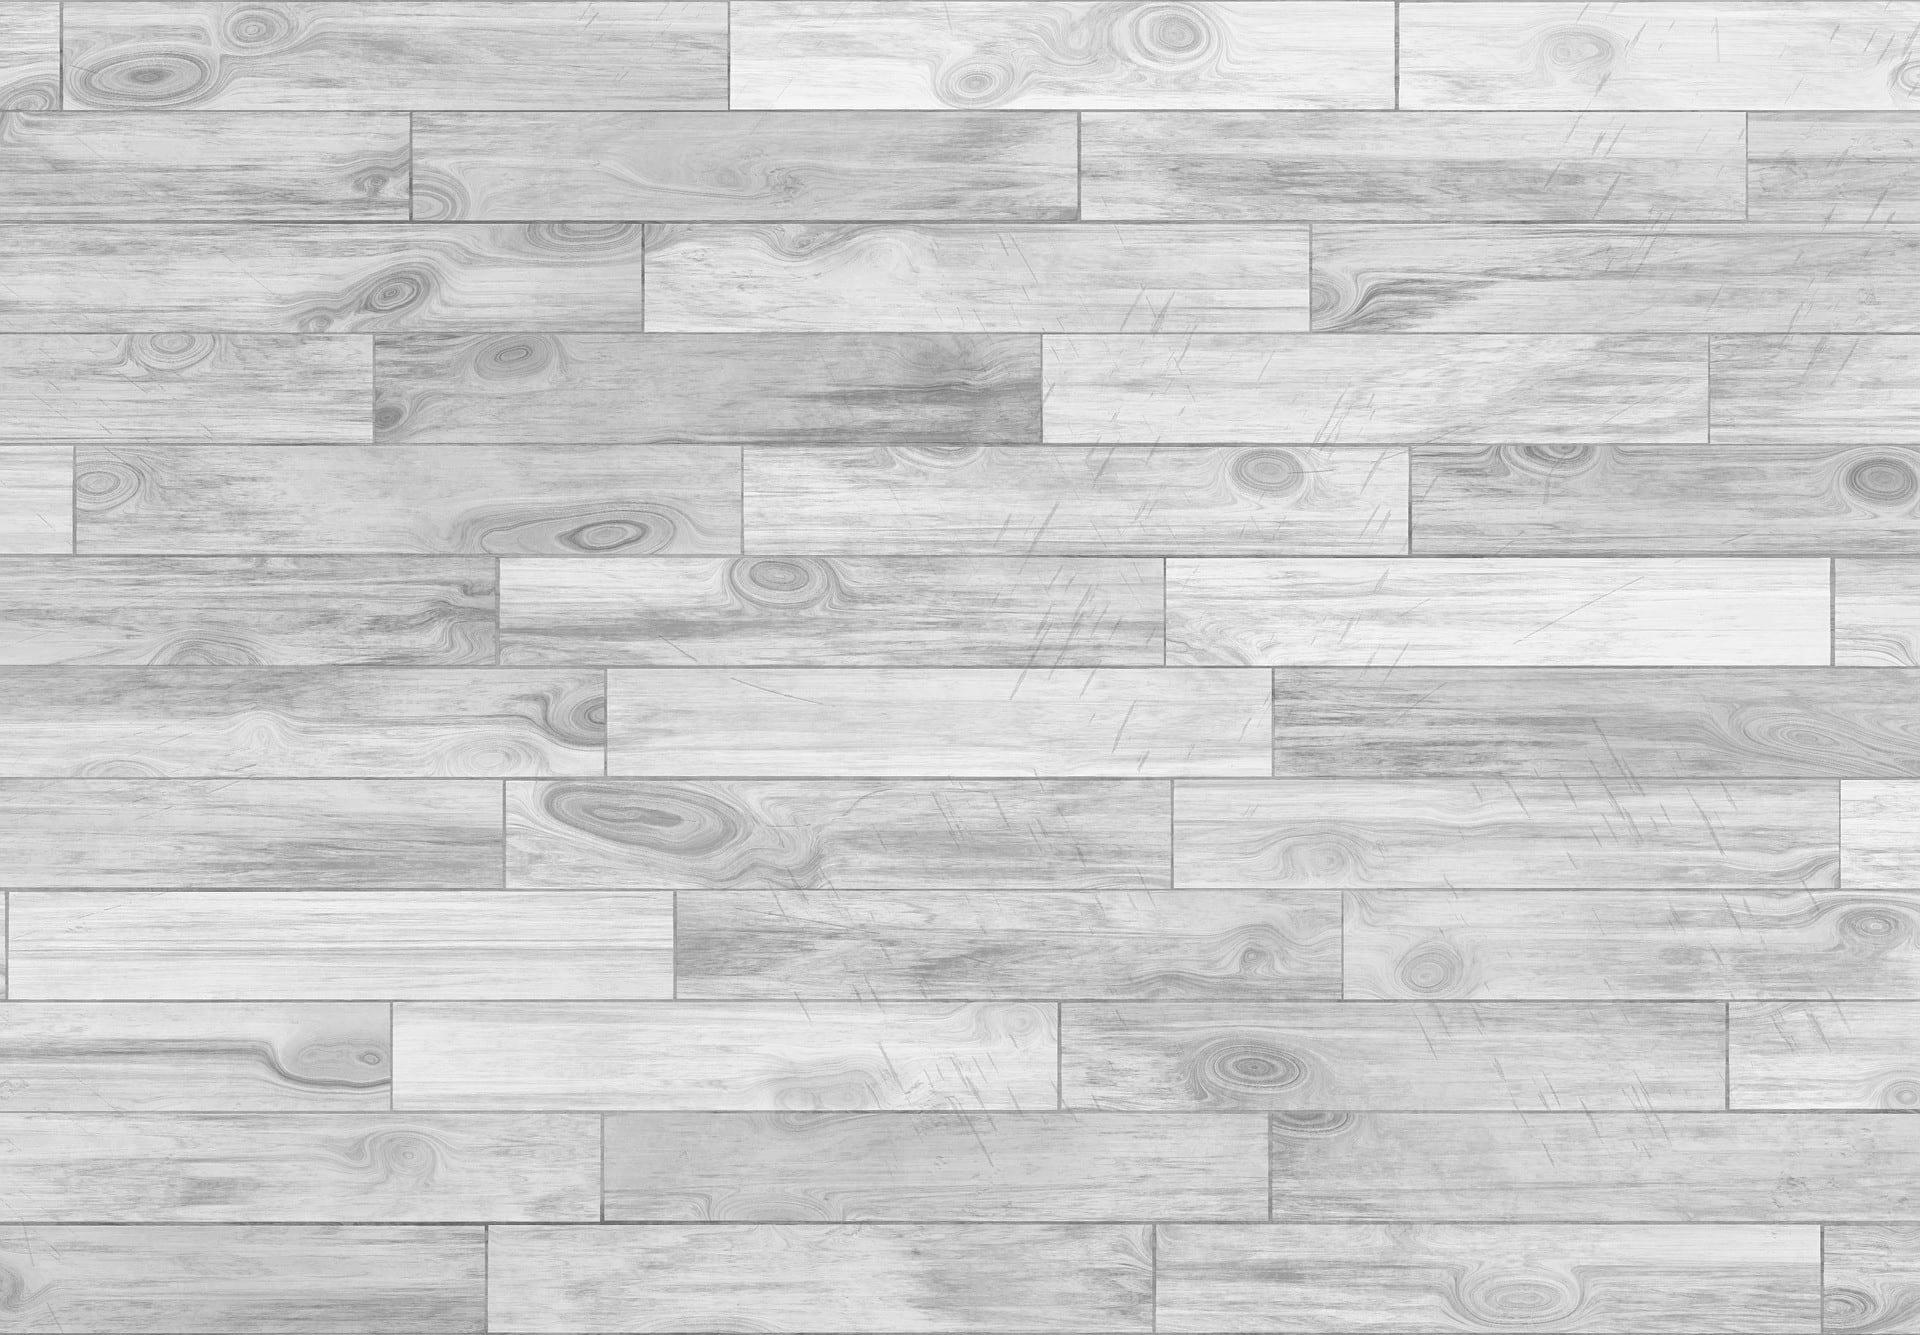 How To Make Laminate Floors Shine At, Photos Of Laminate Flooring